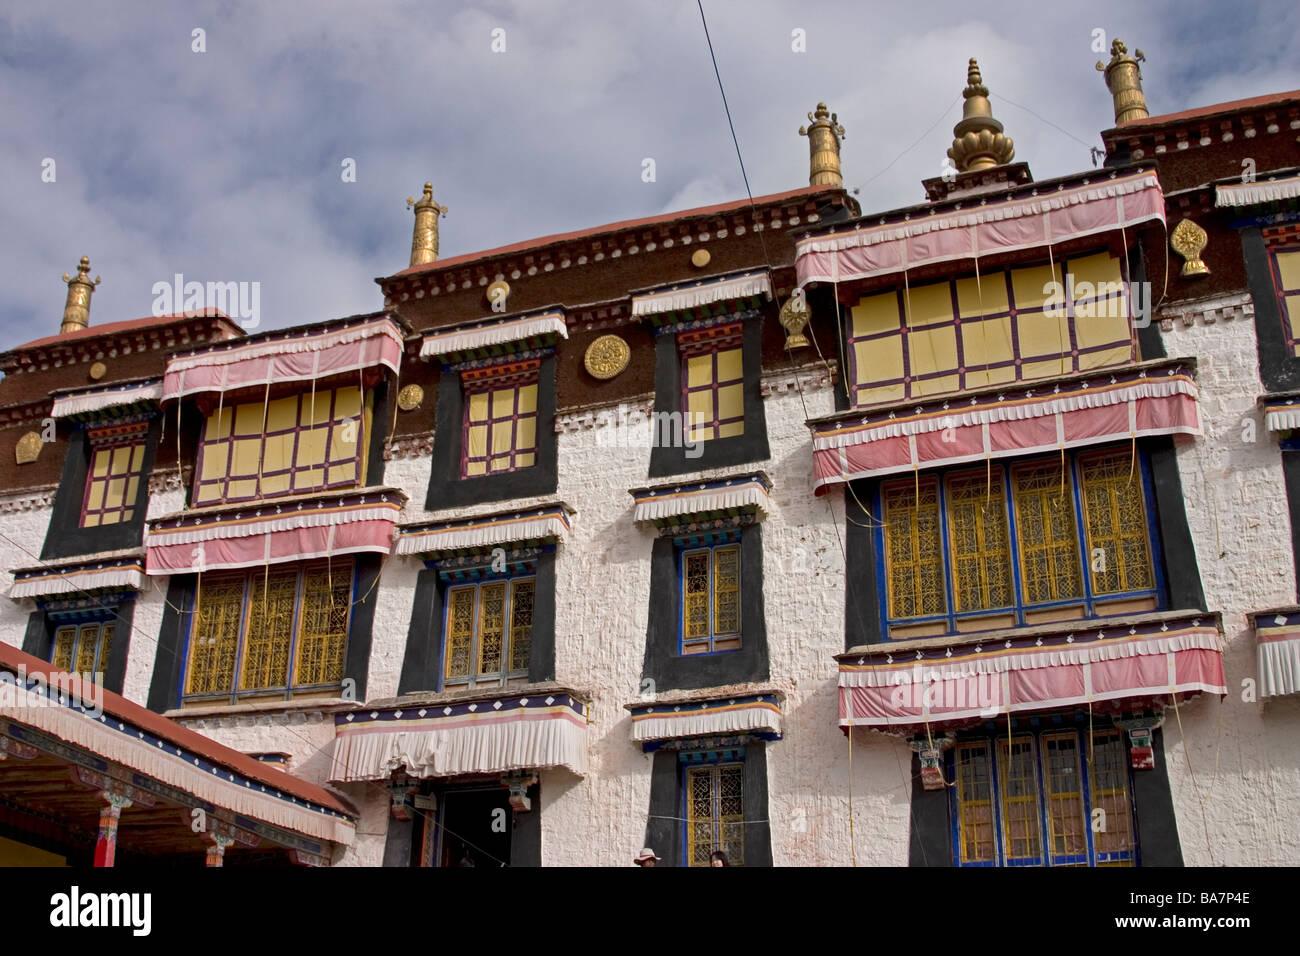 the Sera Monastery, Lhasa, Tibet - Stock Image